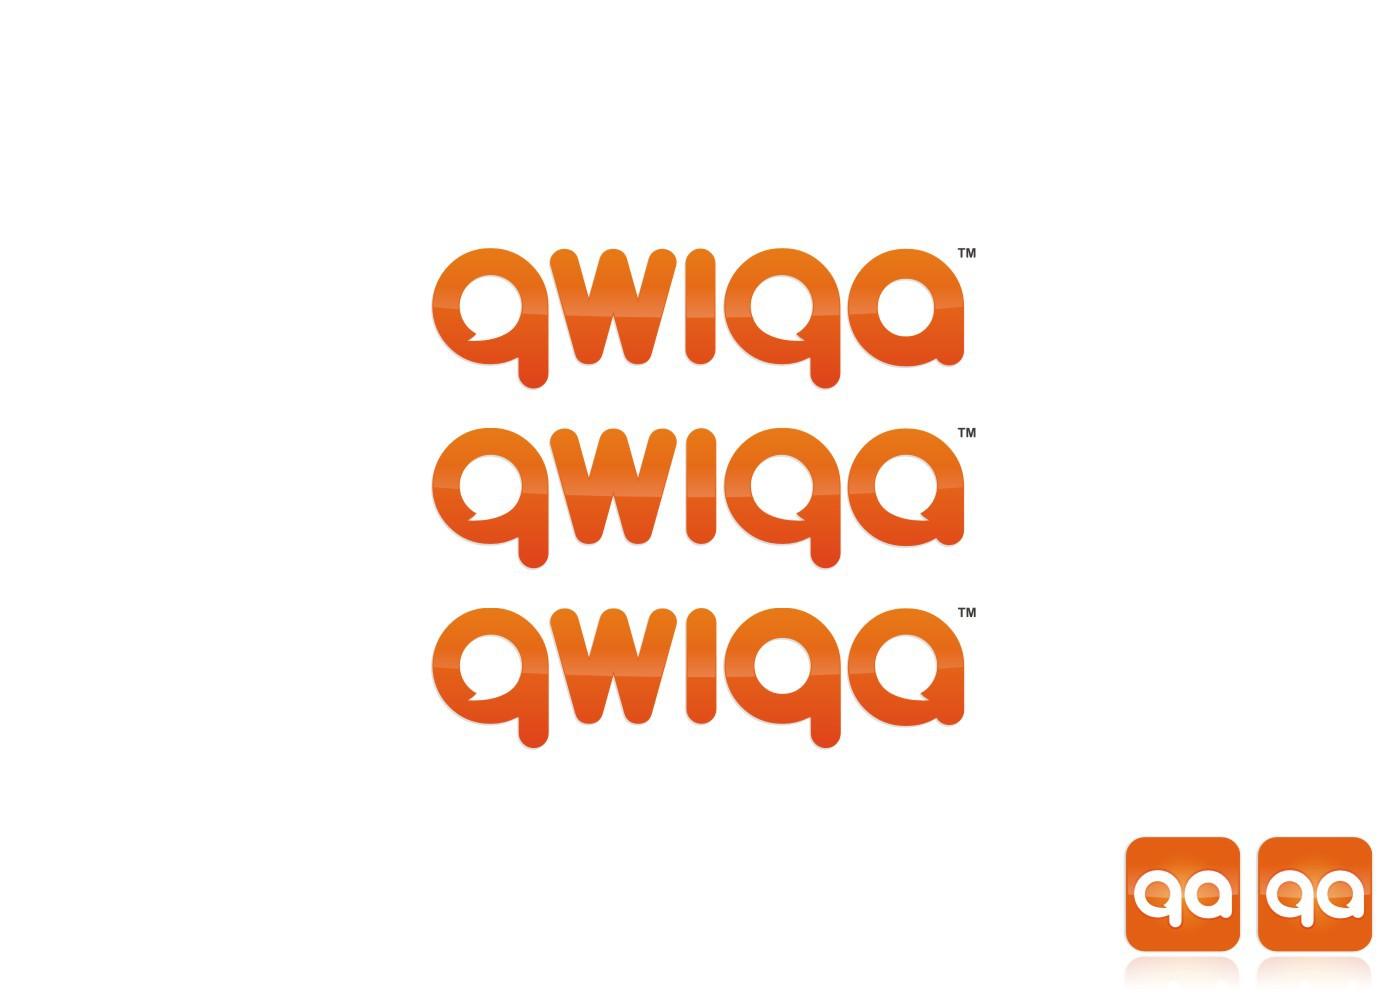 logo for qwiqa